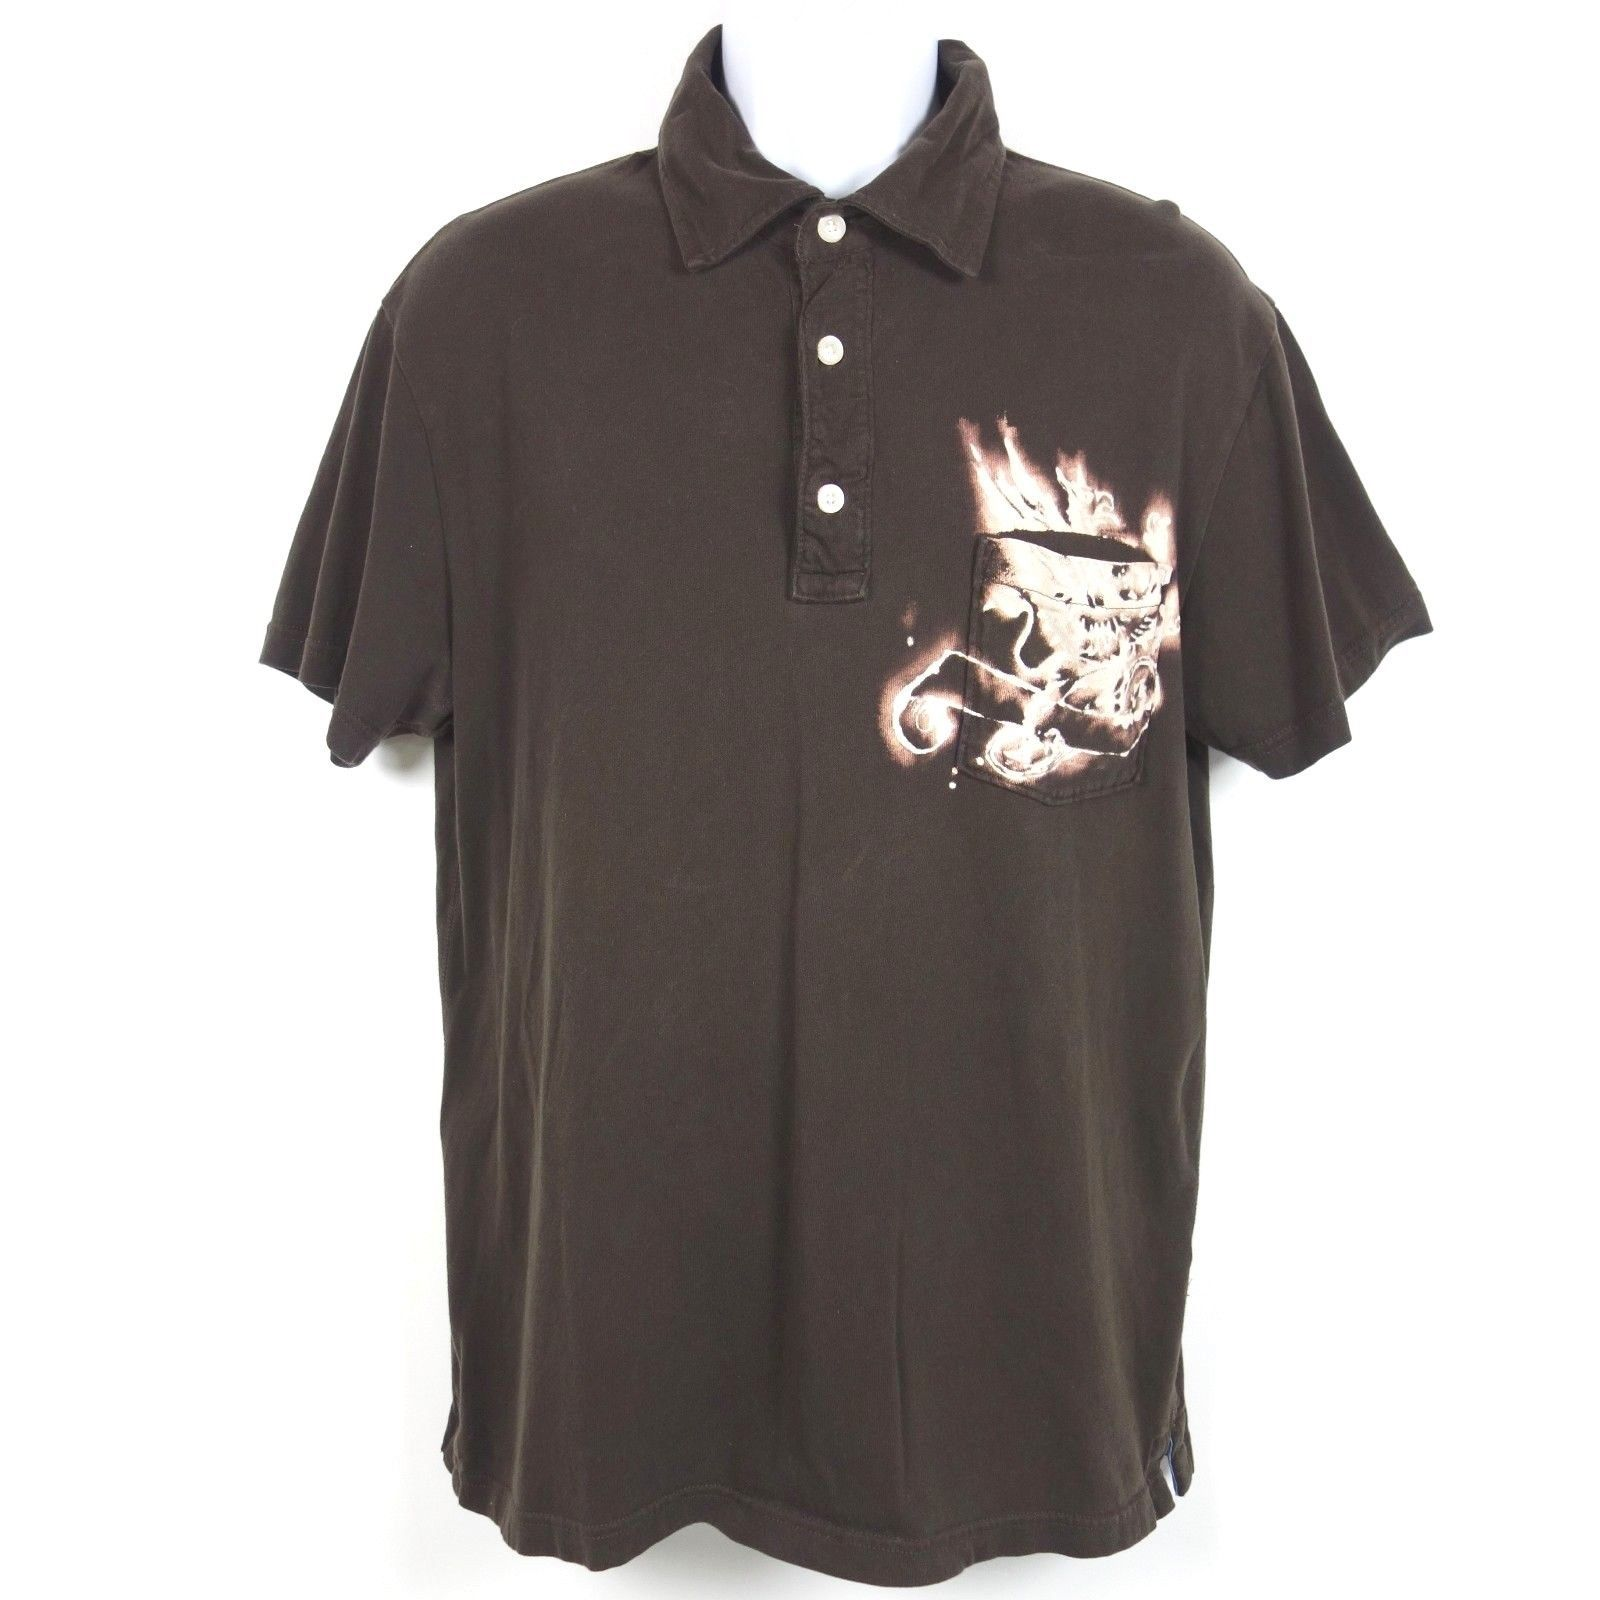 Gap Pocket Polo Shirt Men's Large Brown Cotton Bleached Design Established 1969